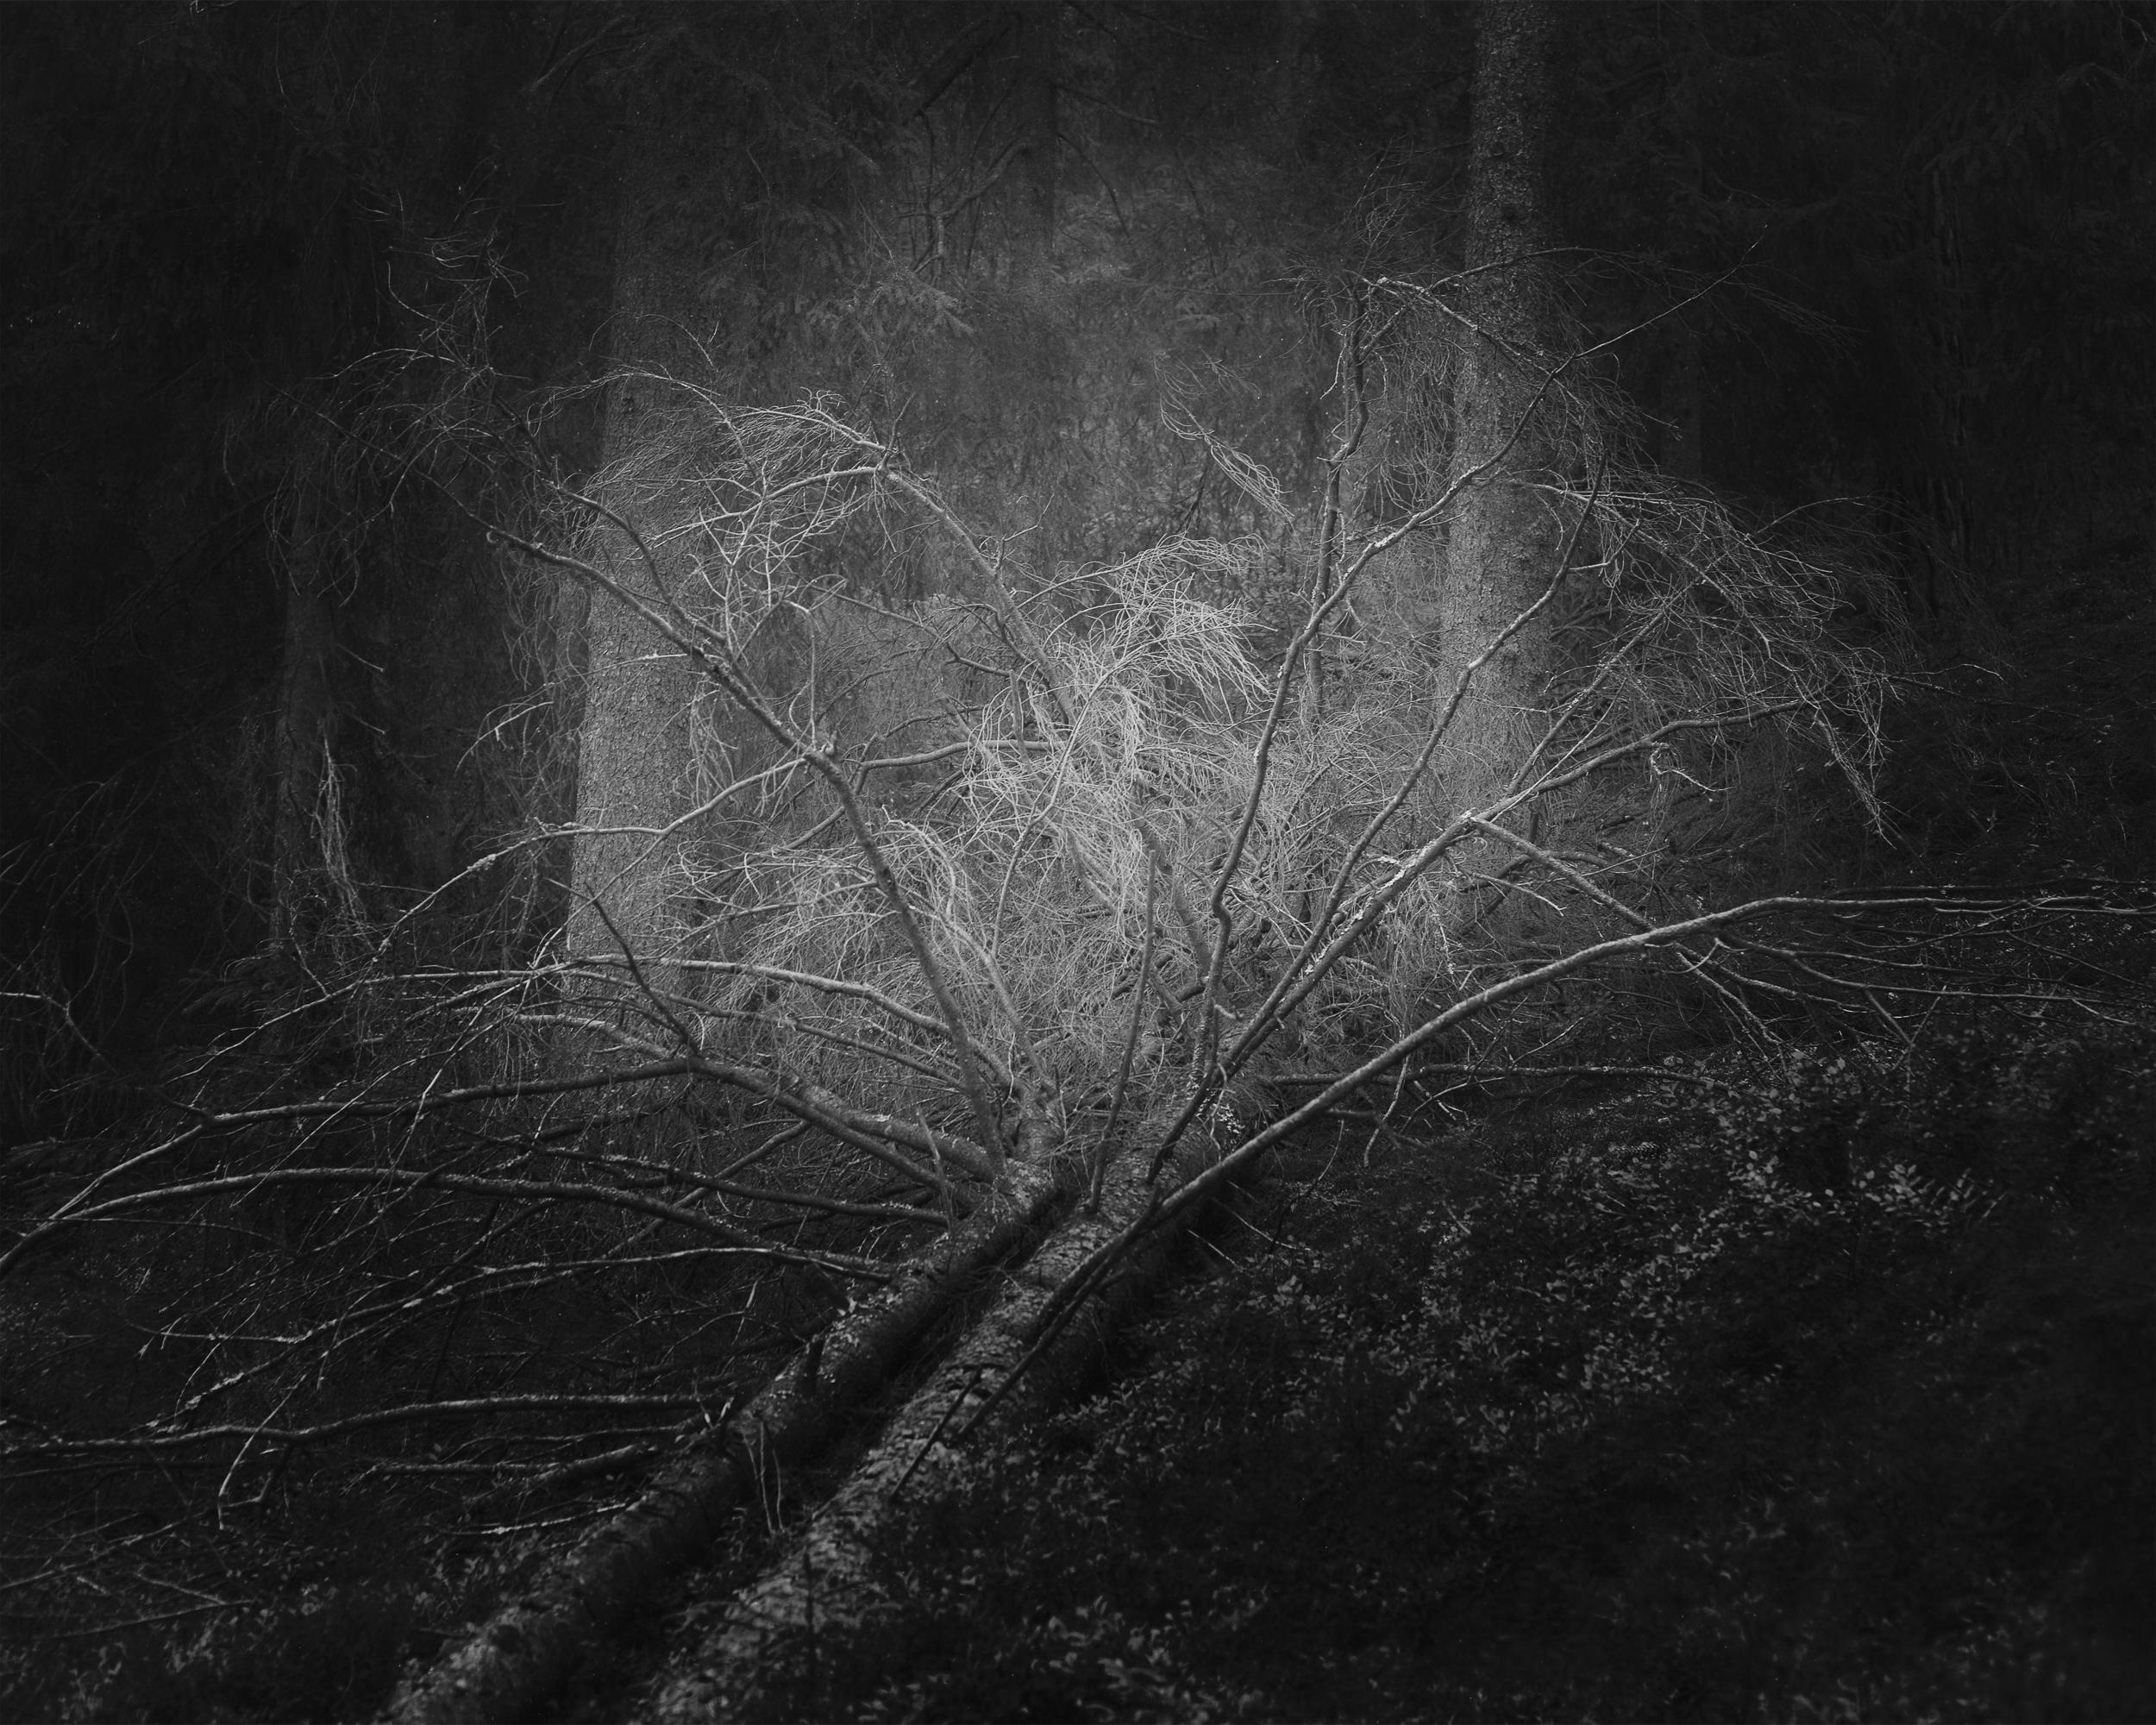 CRUEL NATURE / 2015 Various Sizes / Archival Pigment Print